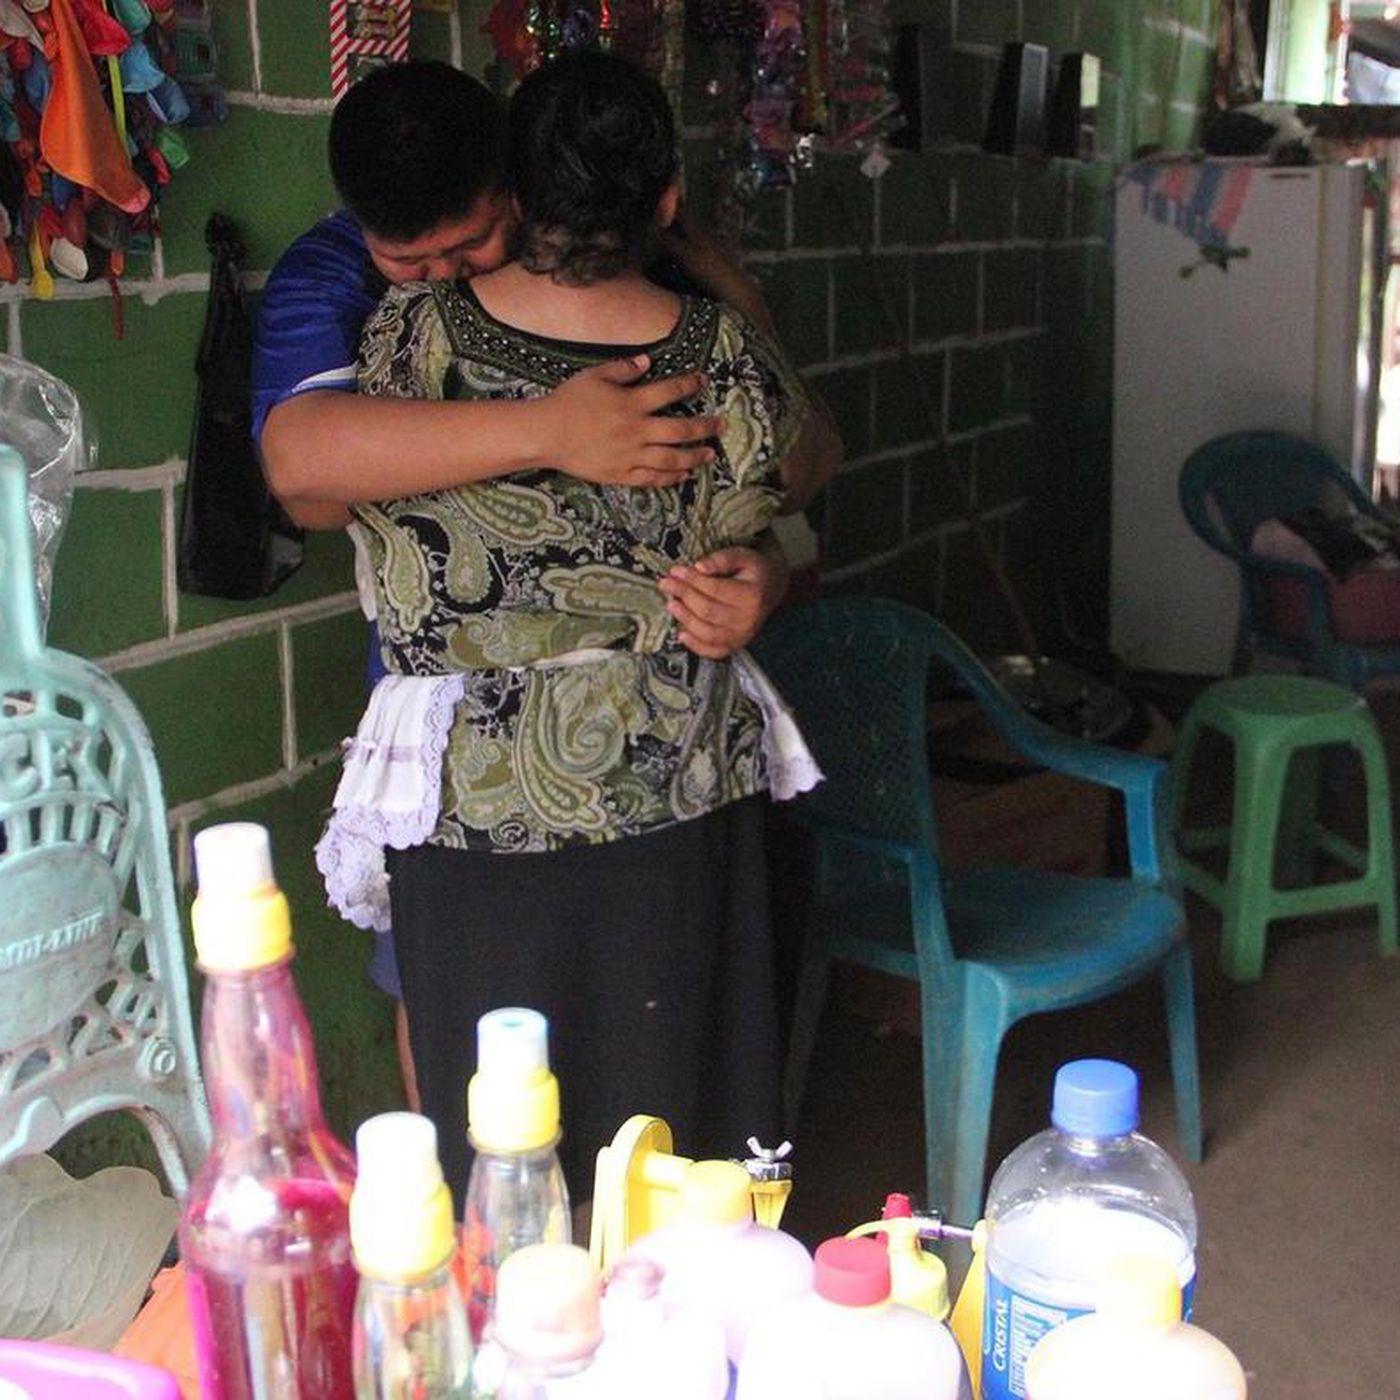 With her daughter facing certain death in El Salvador, a